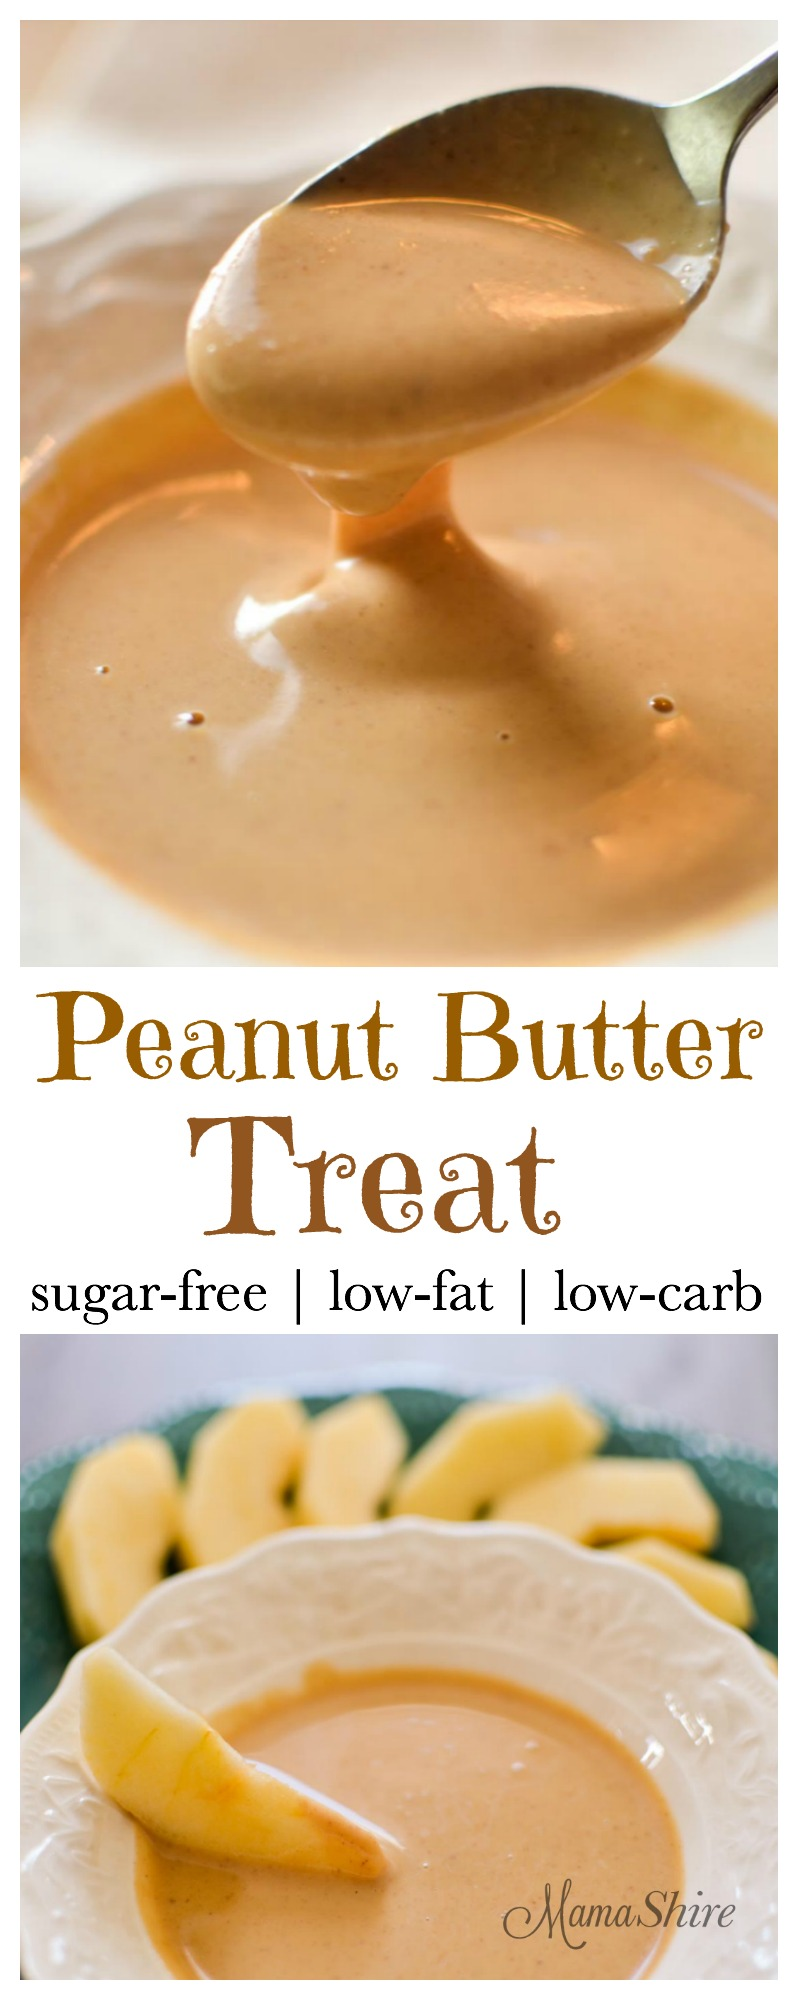 Peanut Butter Treat - Sugar-free, Low-carb, Low-fat